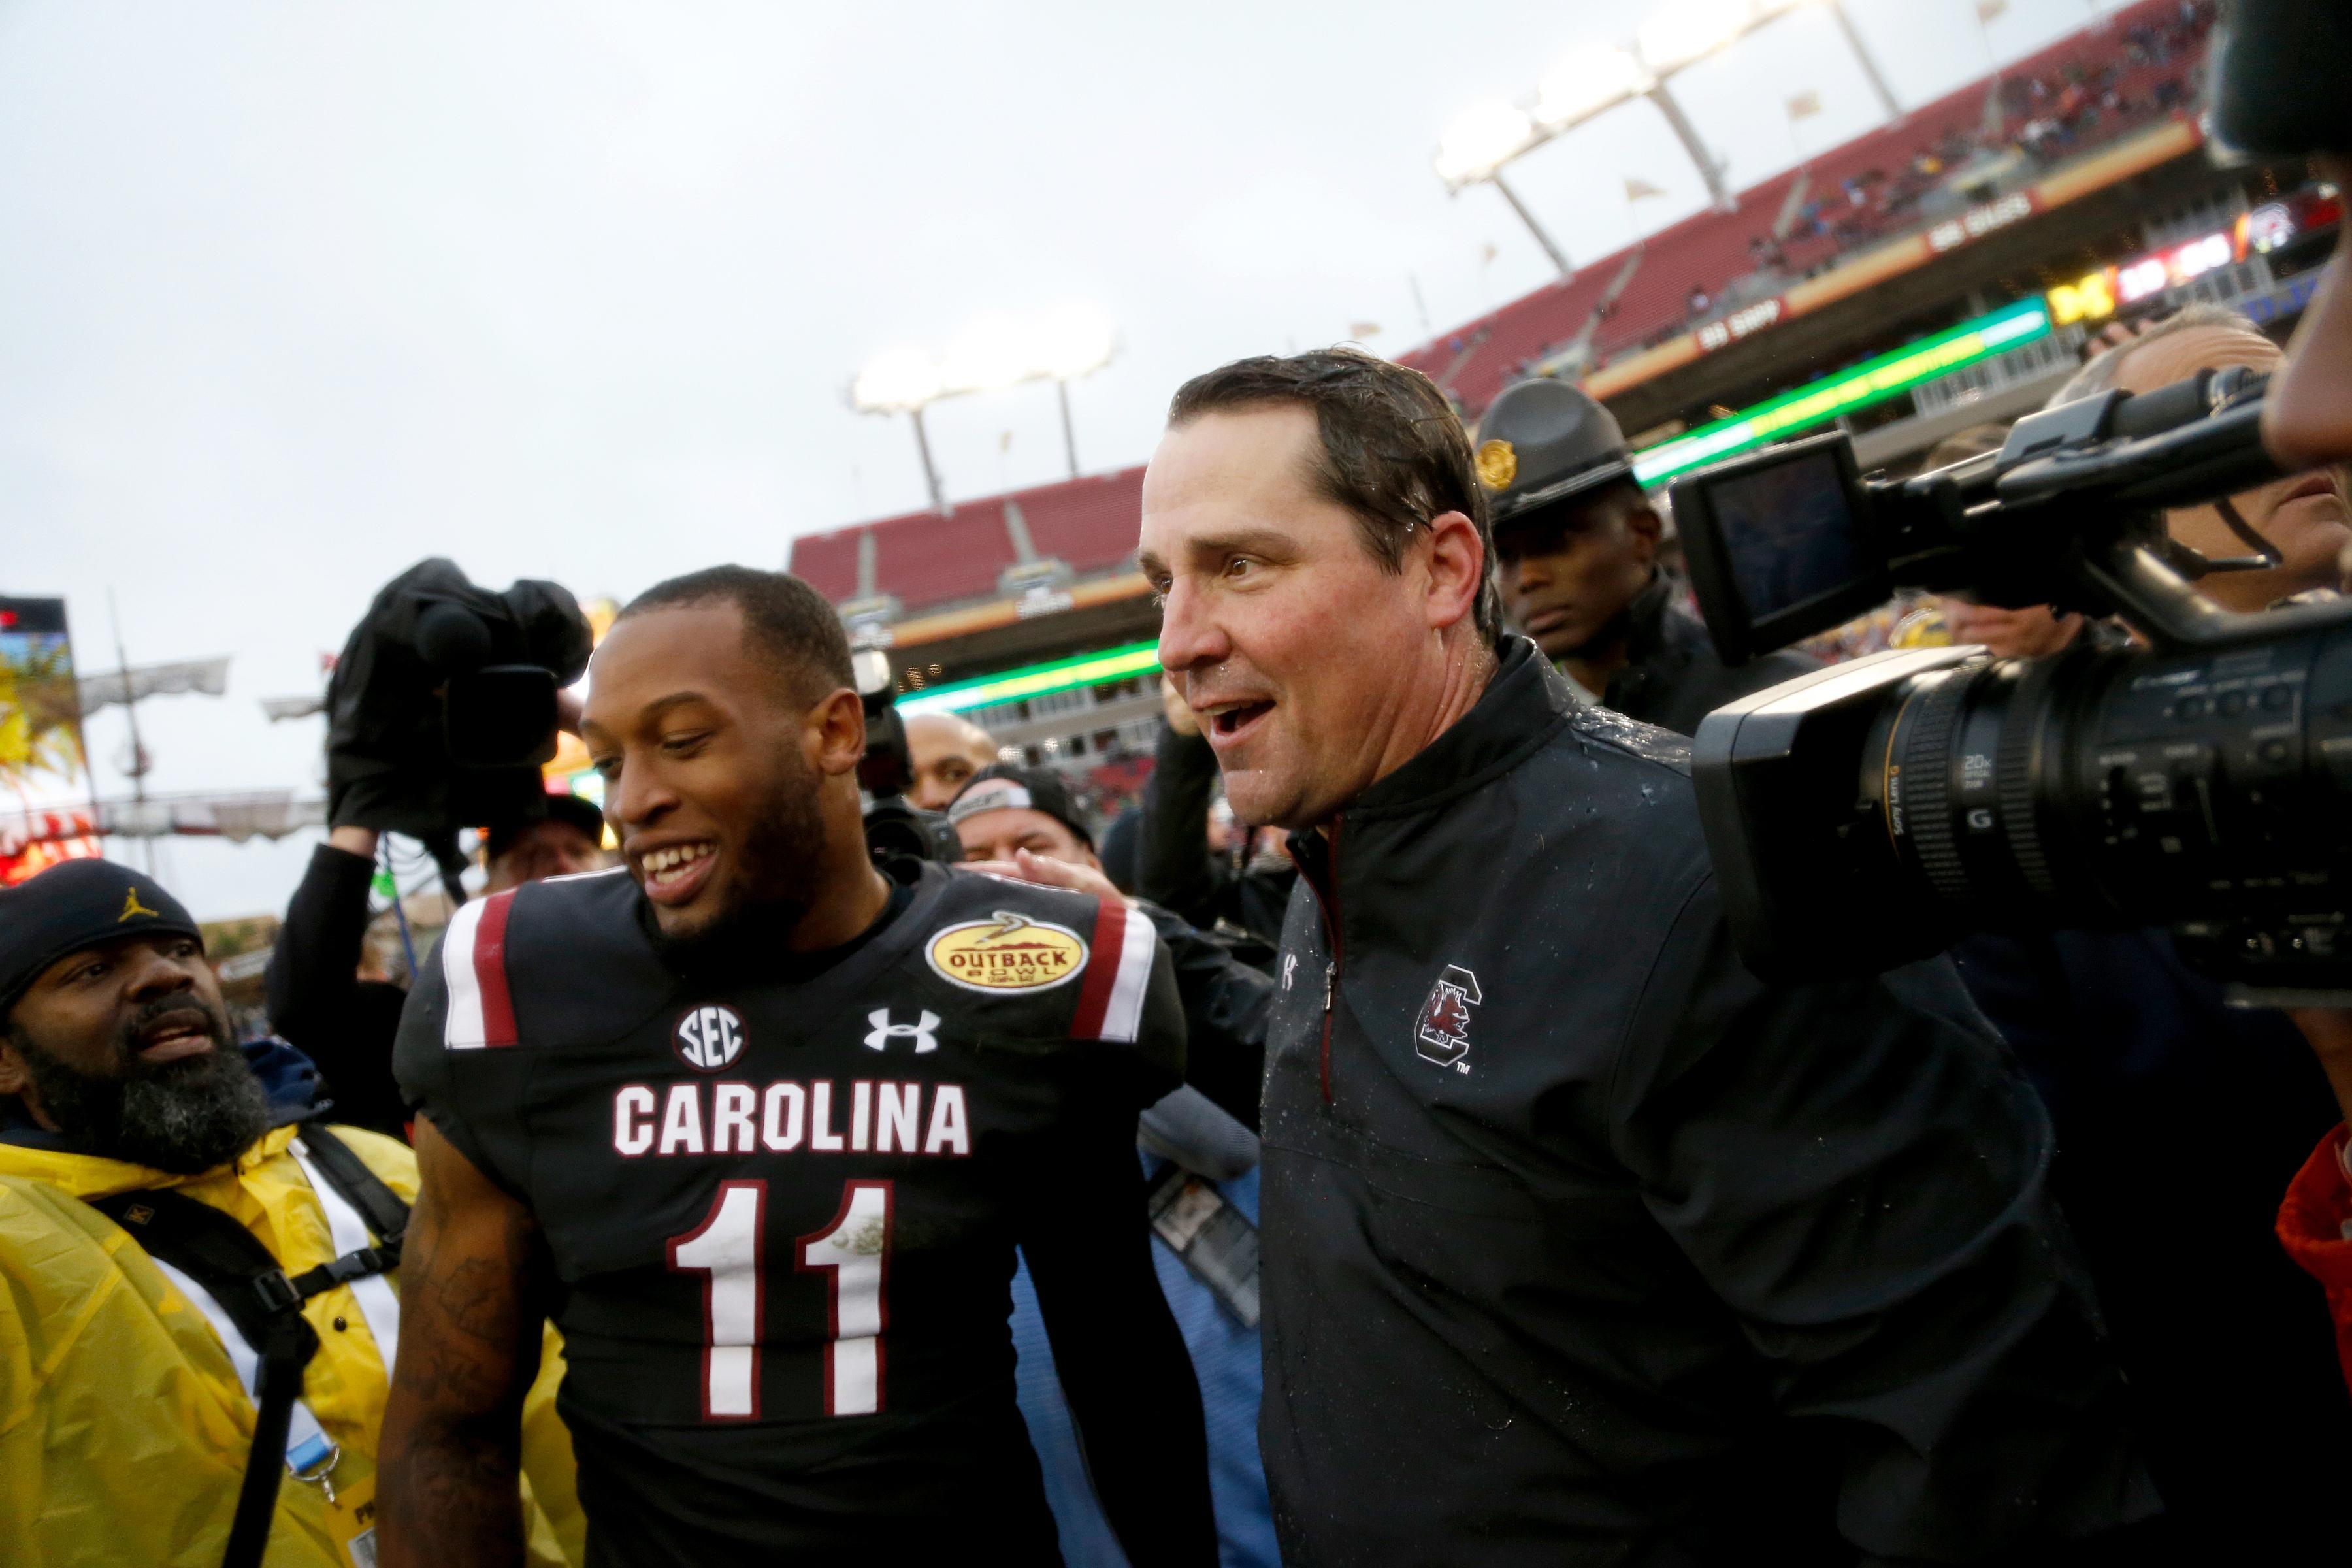 South Carolina Football Recruiting Garnet And Black Attack